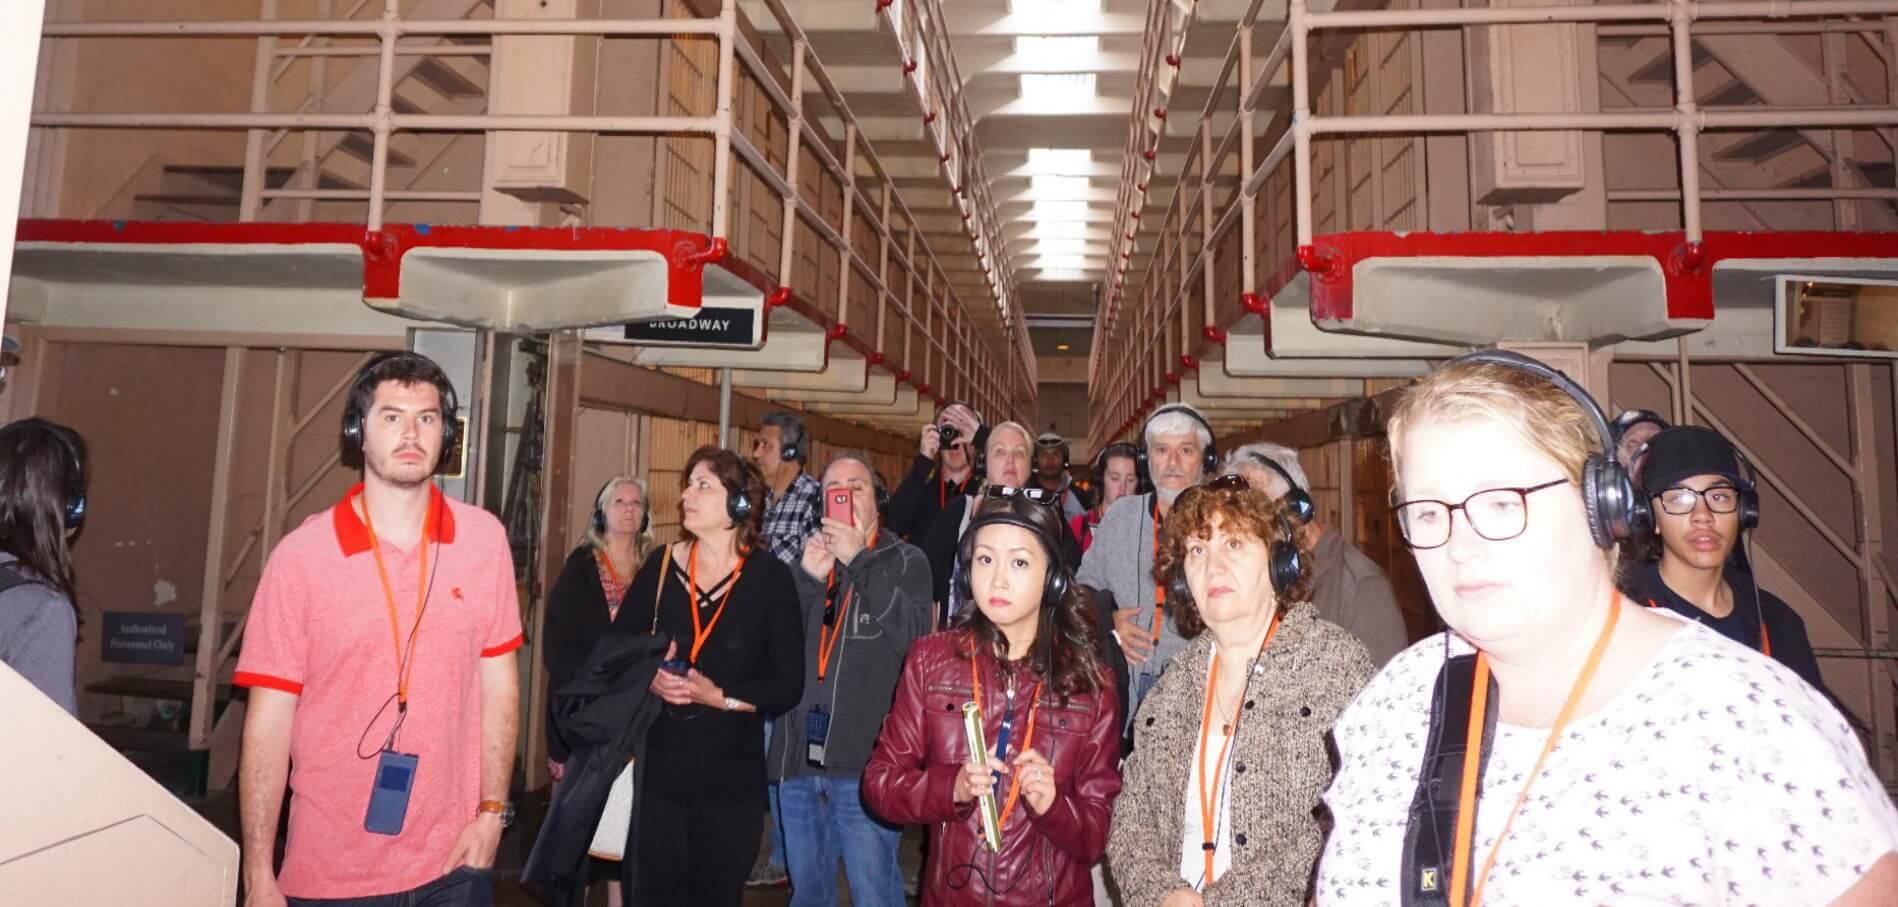 Alcatraz-Island-nightime-Prison-Cell-Walking-Audio-our-cells-dark-night-tour